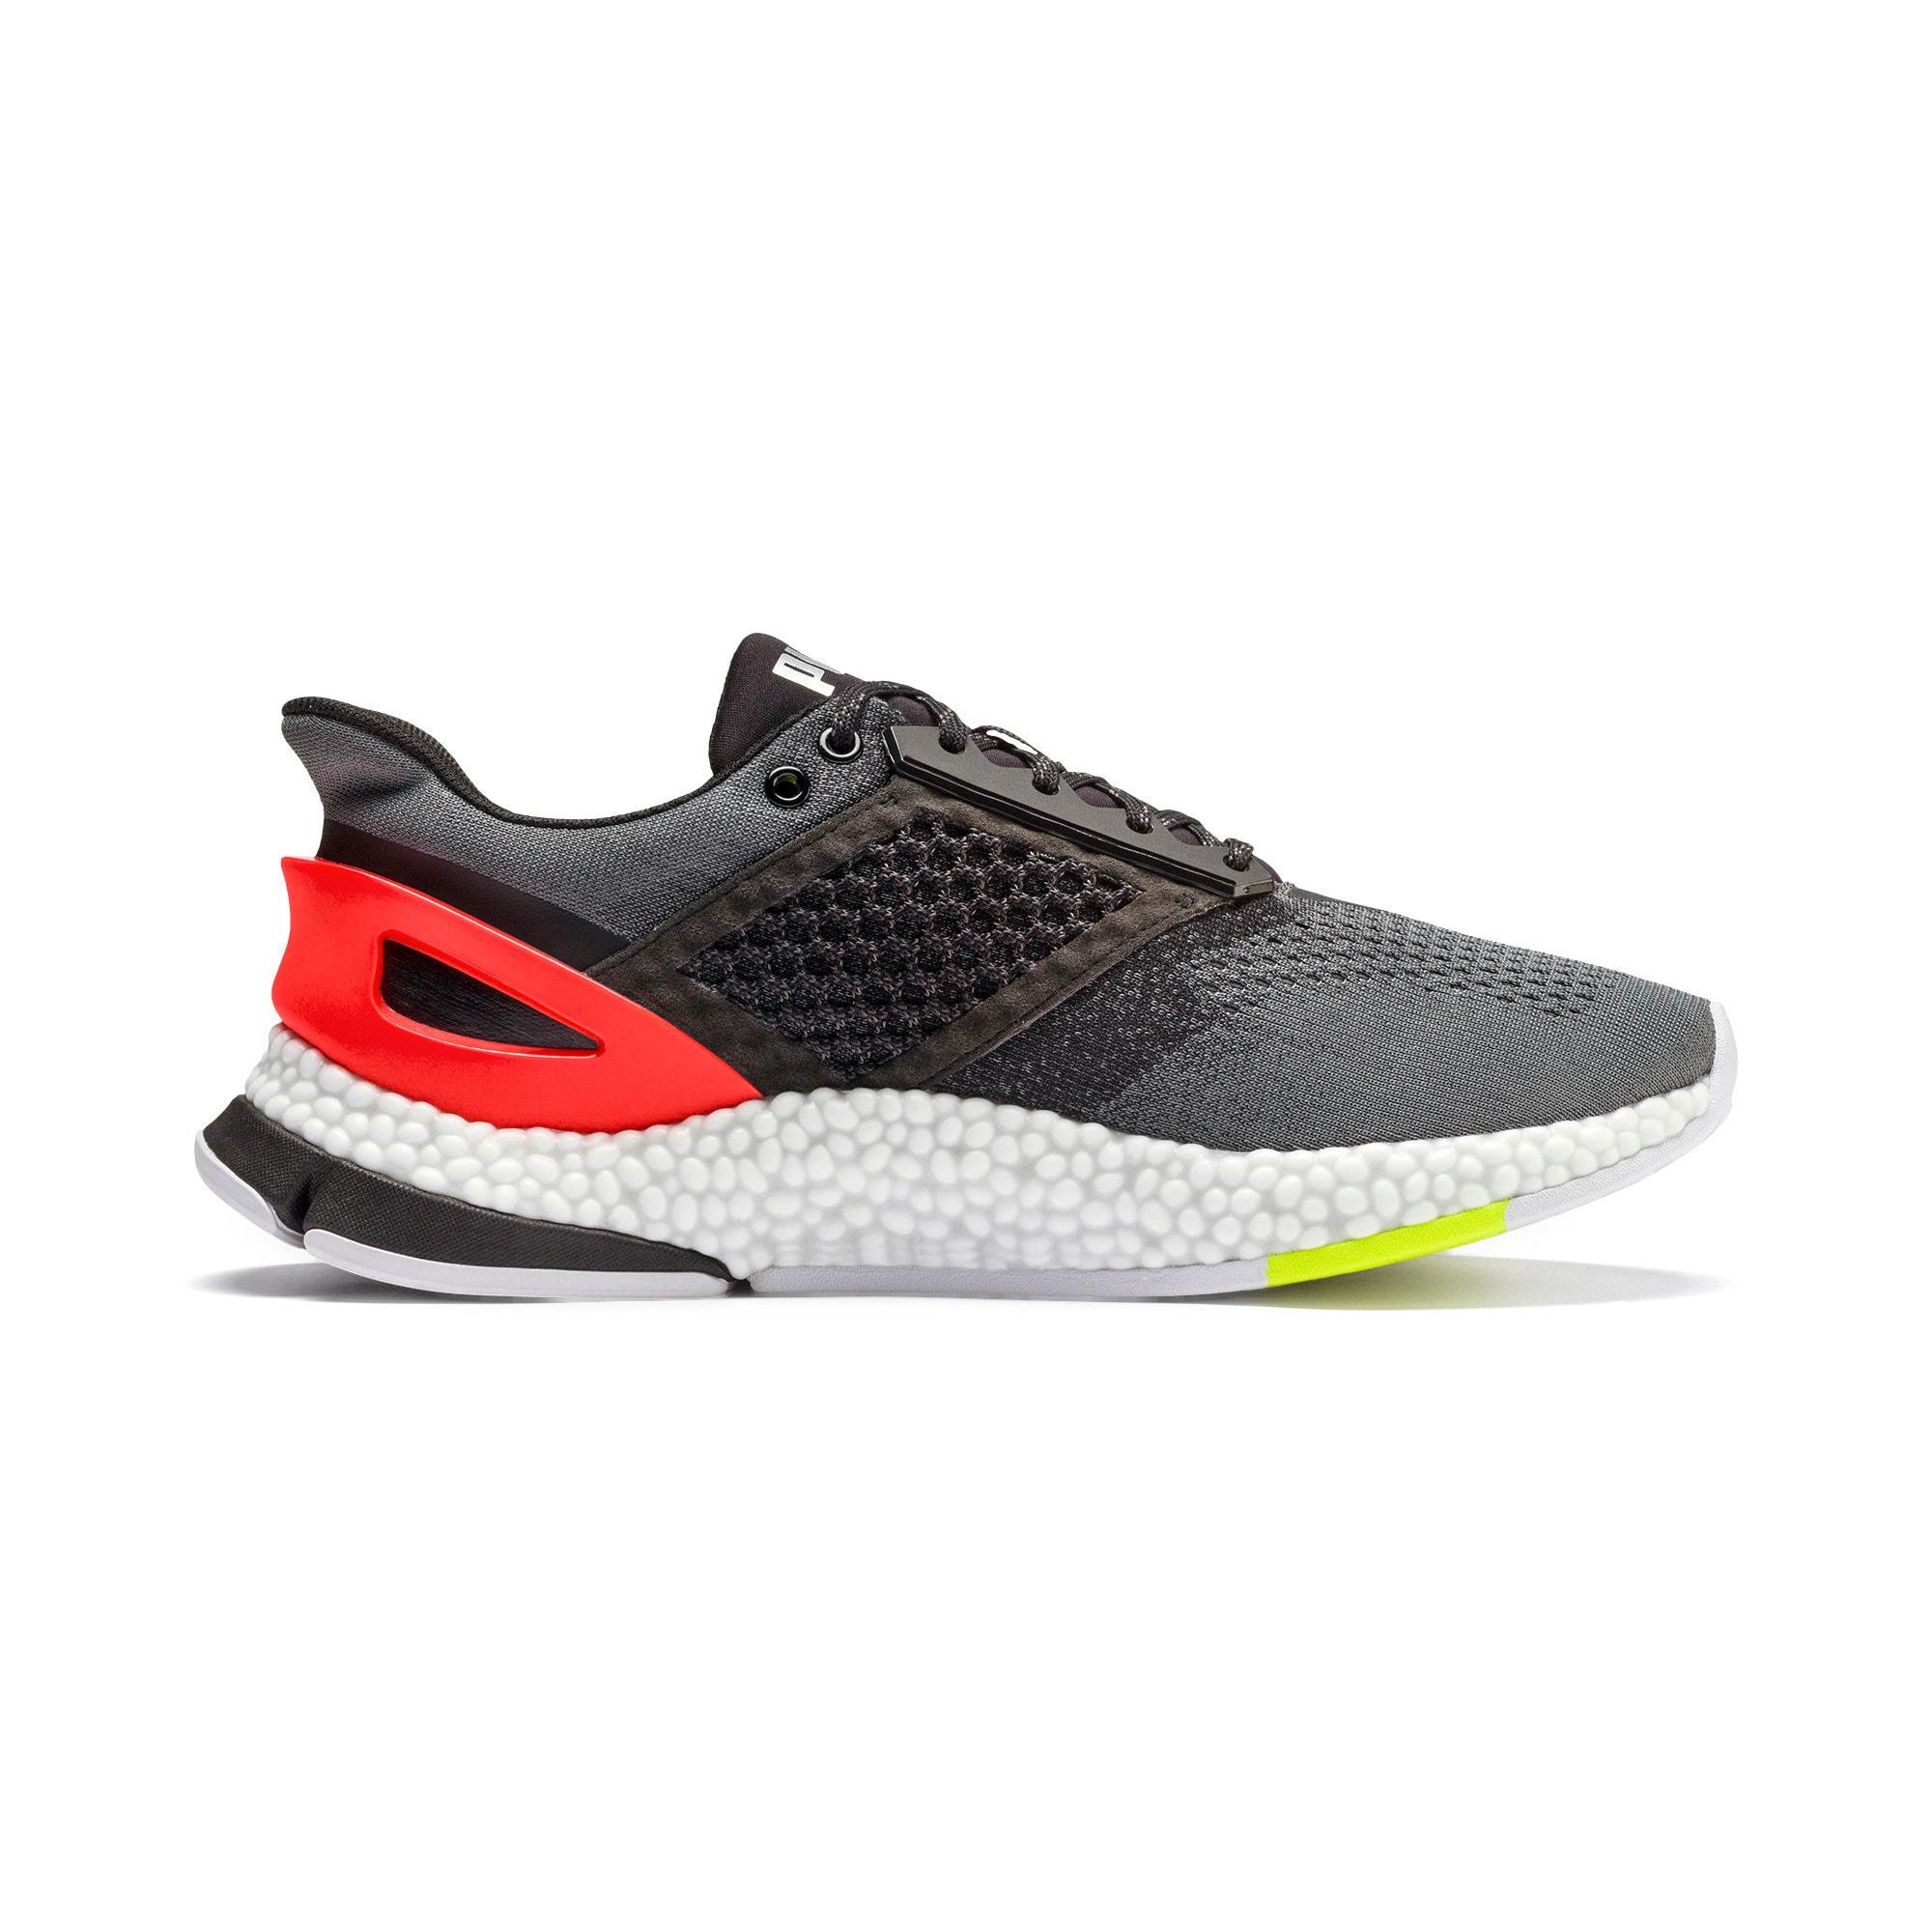 Thumbnail 6 of HYBRID Astro Men's Running Shoes, CASTLEROCK-Puma Blck-Ngy Red, medium